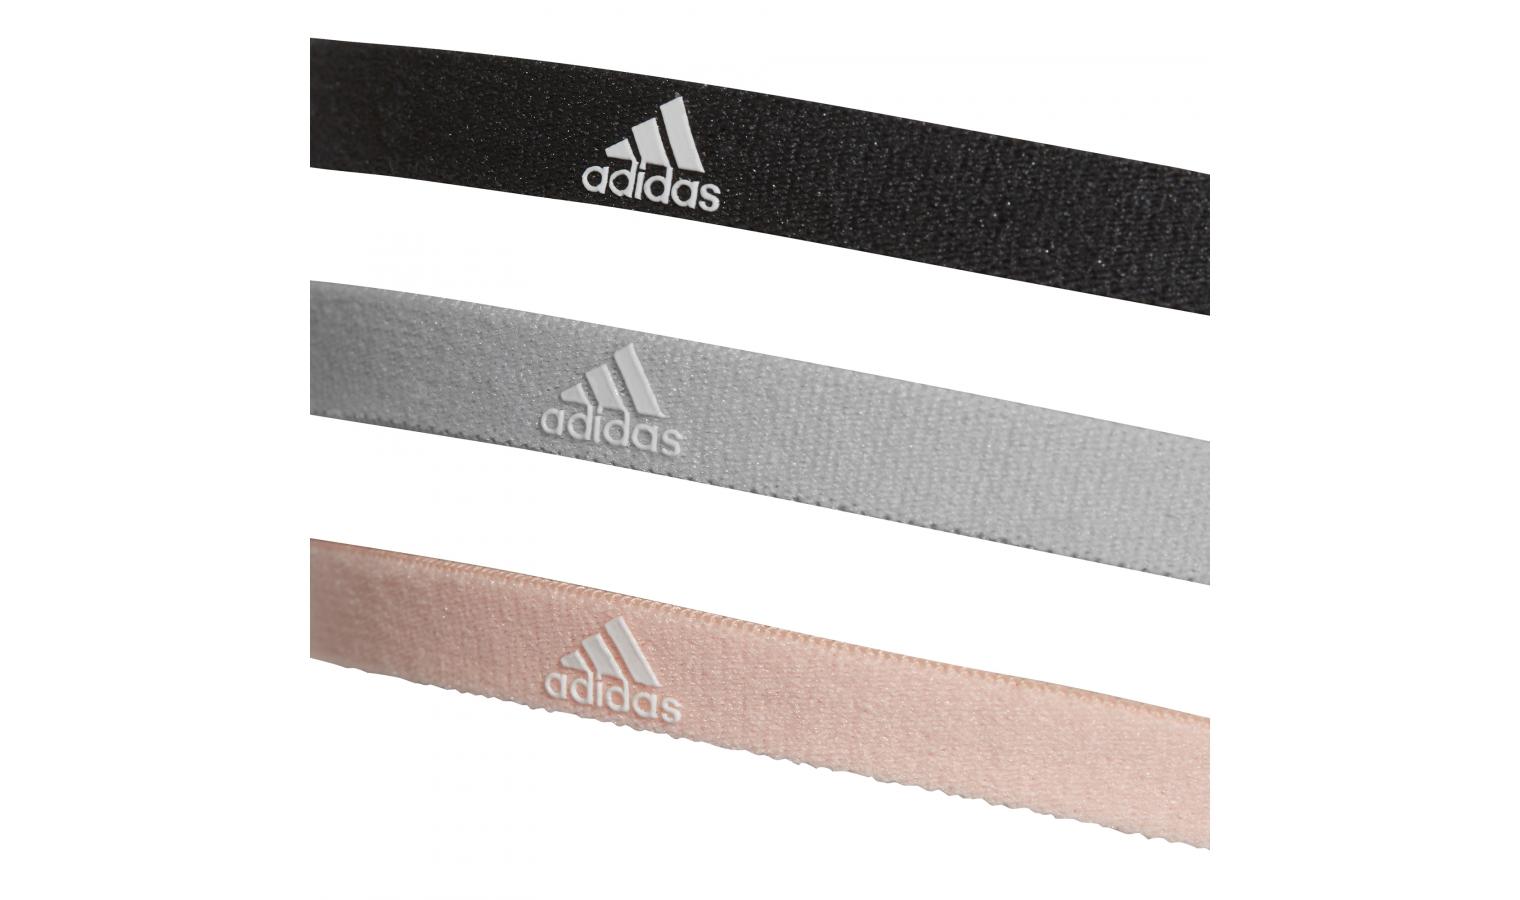 Čelenka adidas 3PP HAIRBAND černá šedá růžová  f65f7b6662